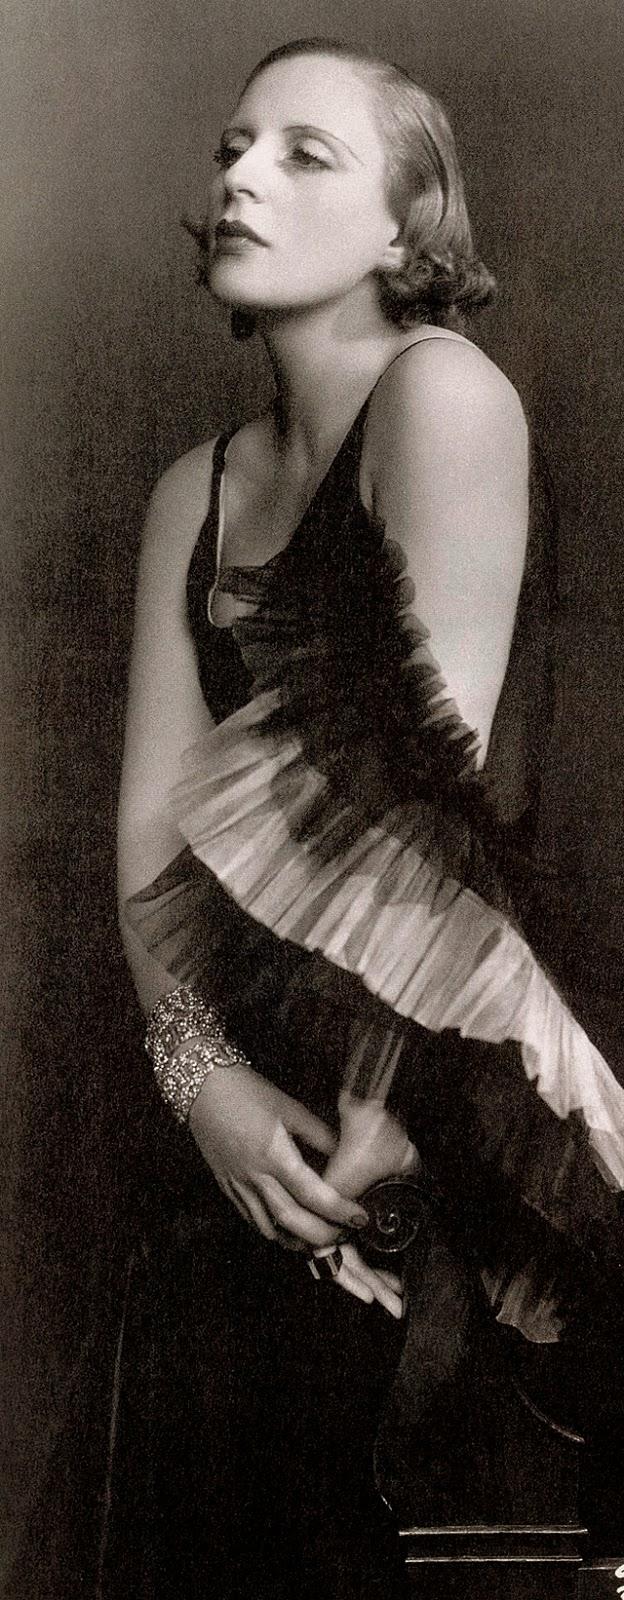 Street fashion, ca. 1920s (6)